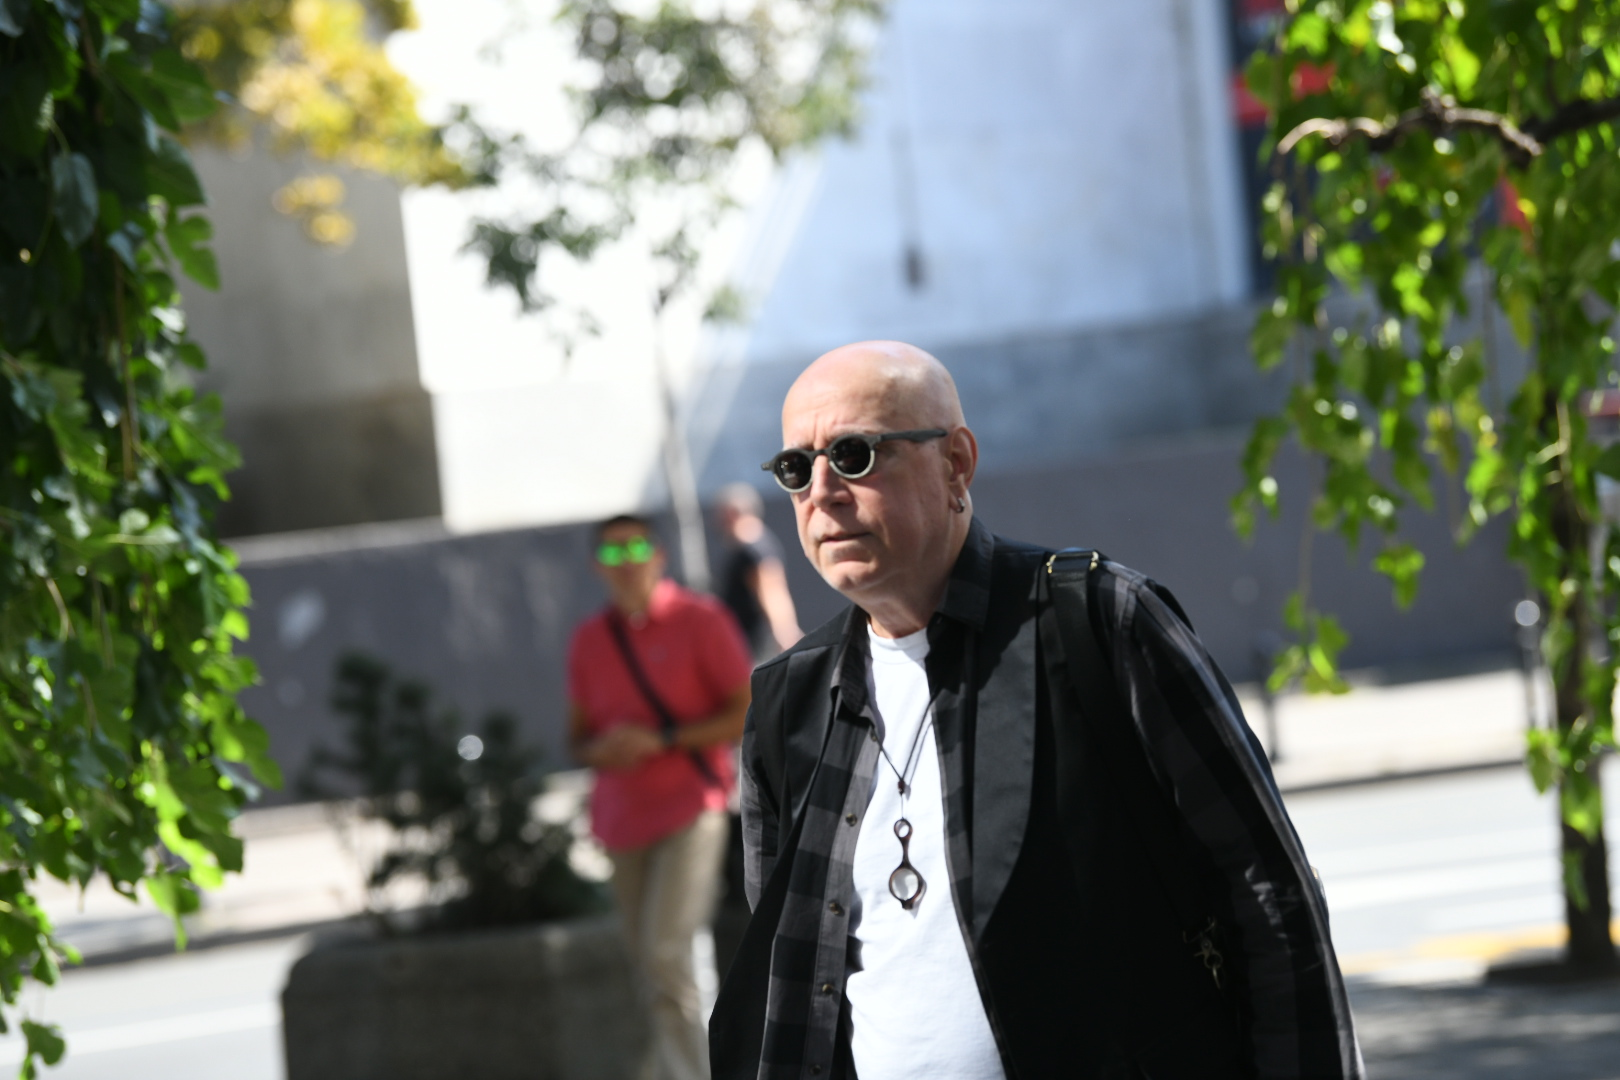 Irfan Mensur Komemoracija glumcu Milanu Lanetu Gutoviću u Jugoslovenskom dramskom pozorištu, JDP, Milan Lane Gutović